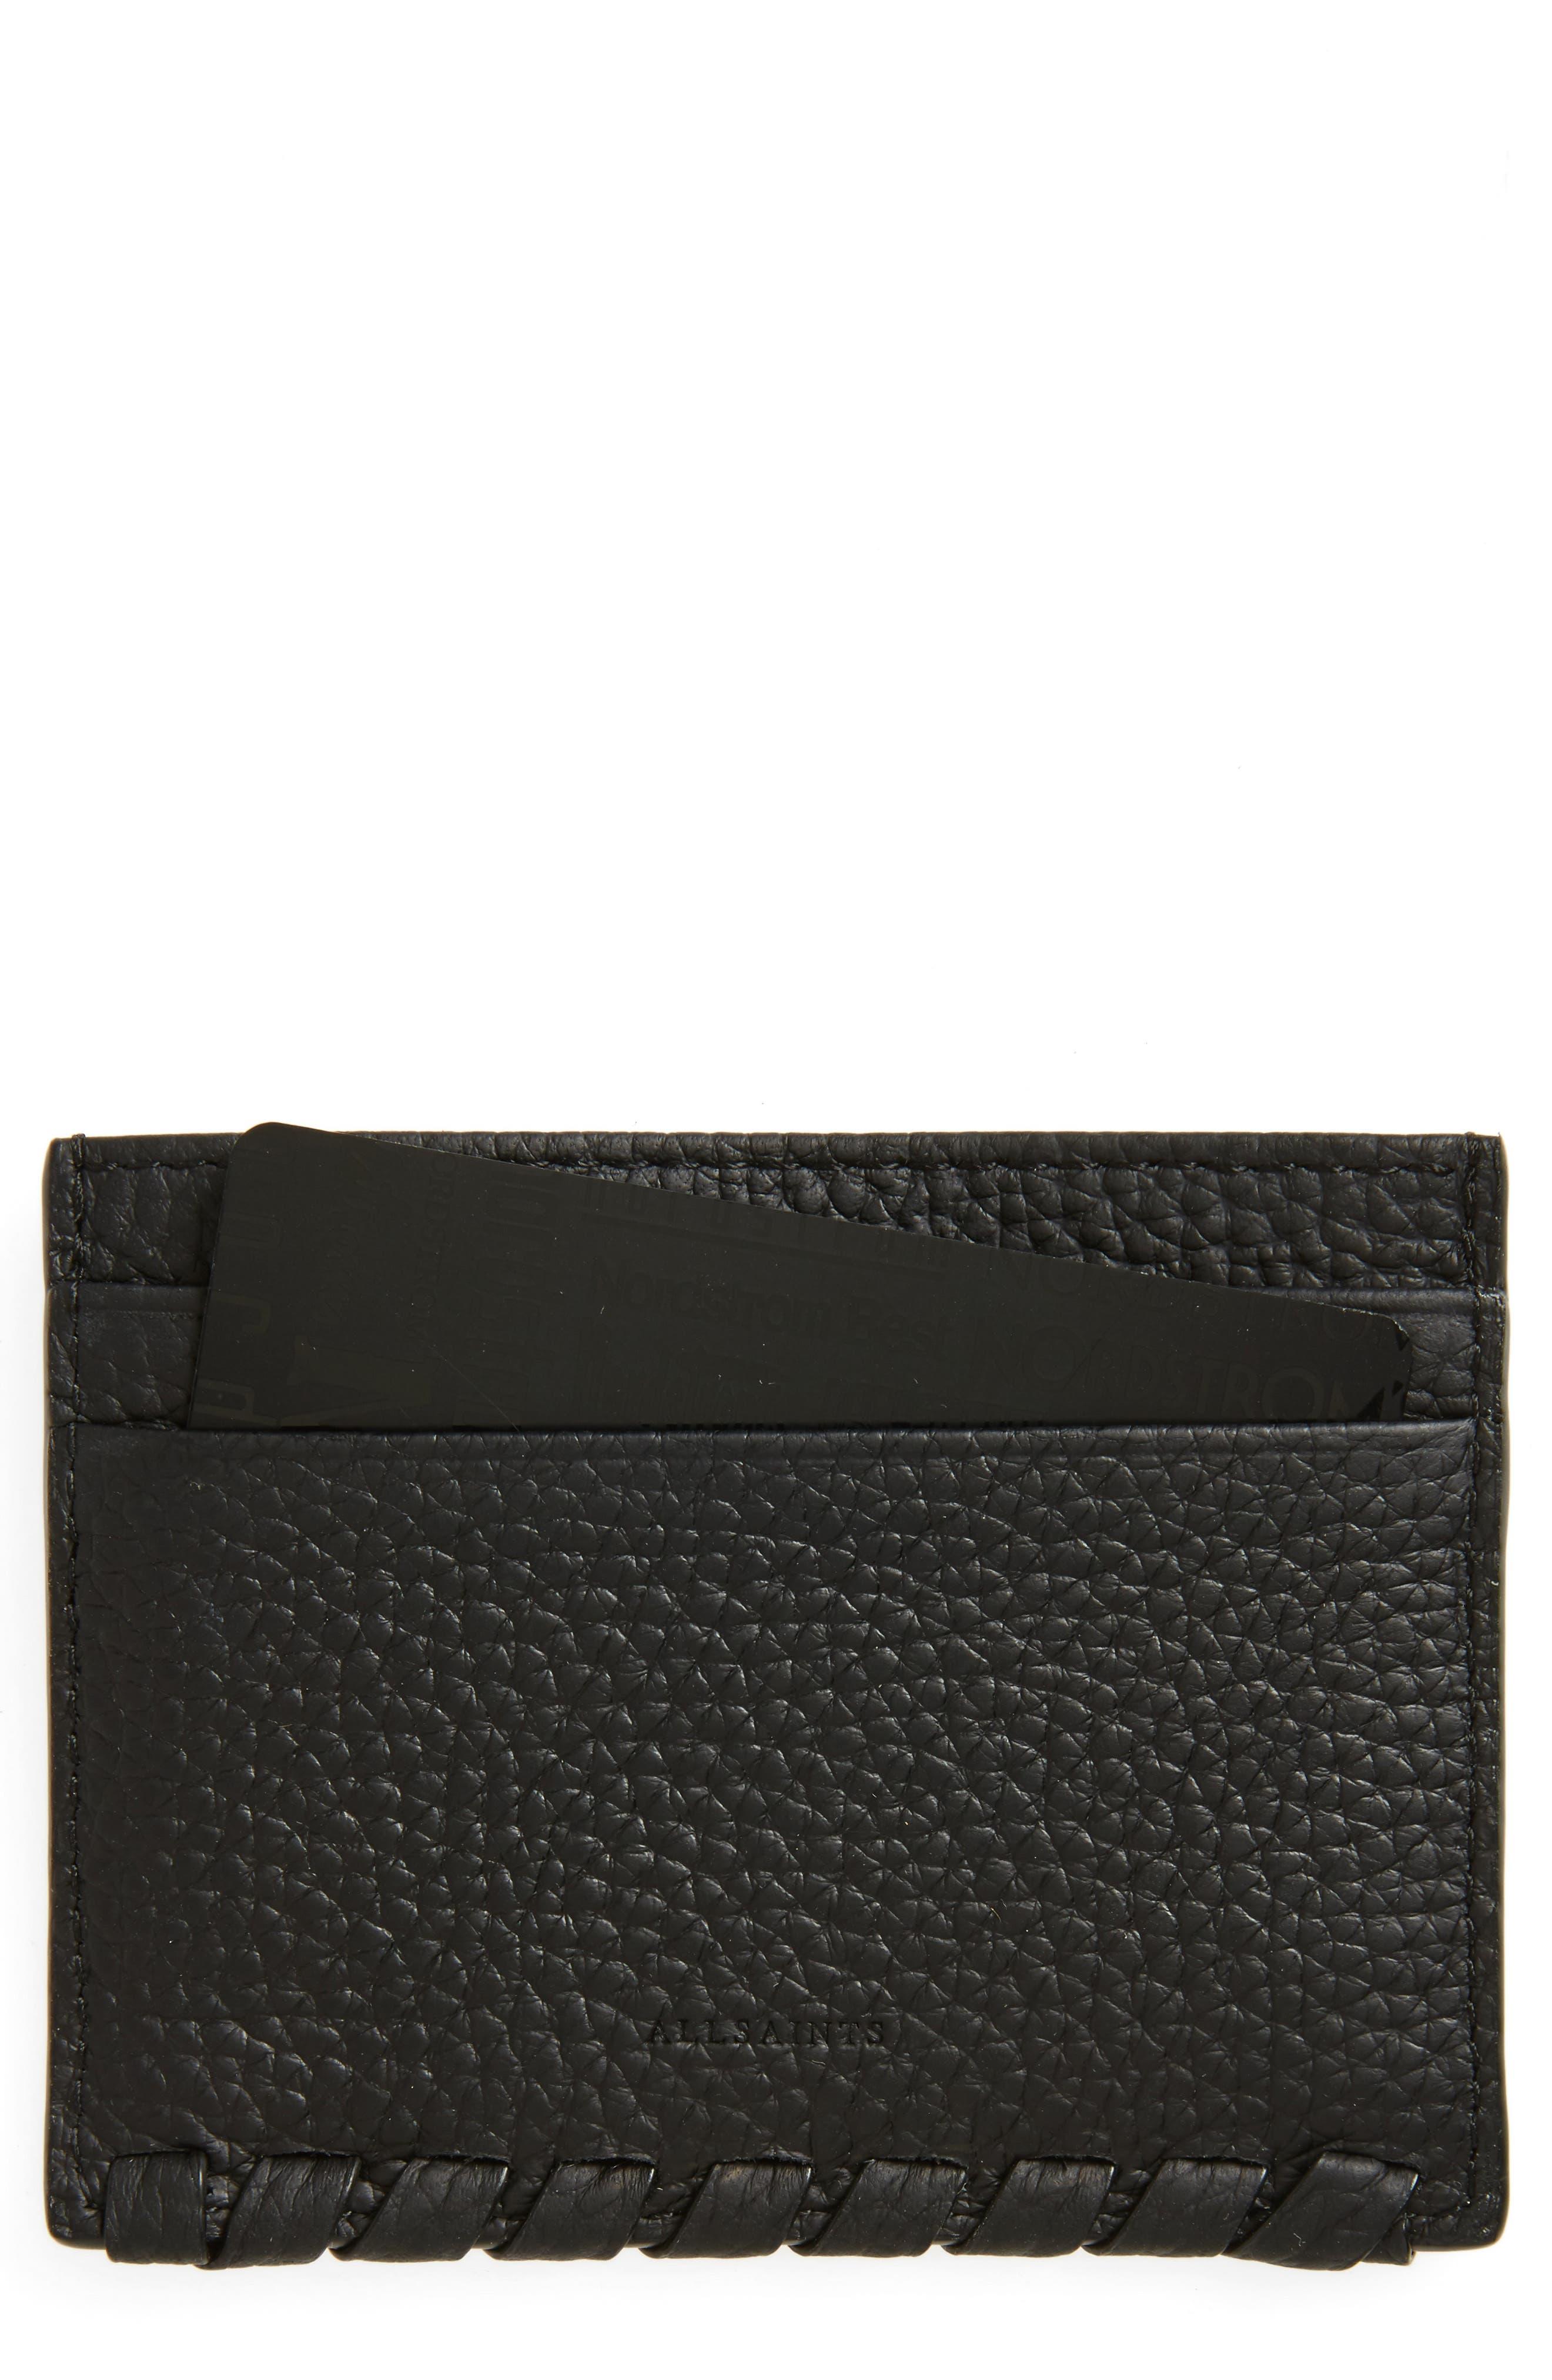 Kita Pebbled Leather Card Case,                             Main thumbnail 1, color,                             001